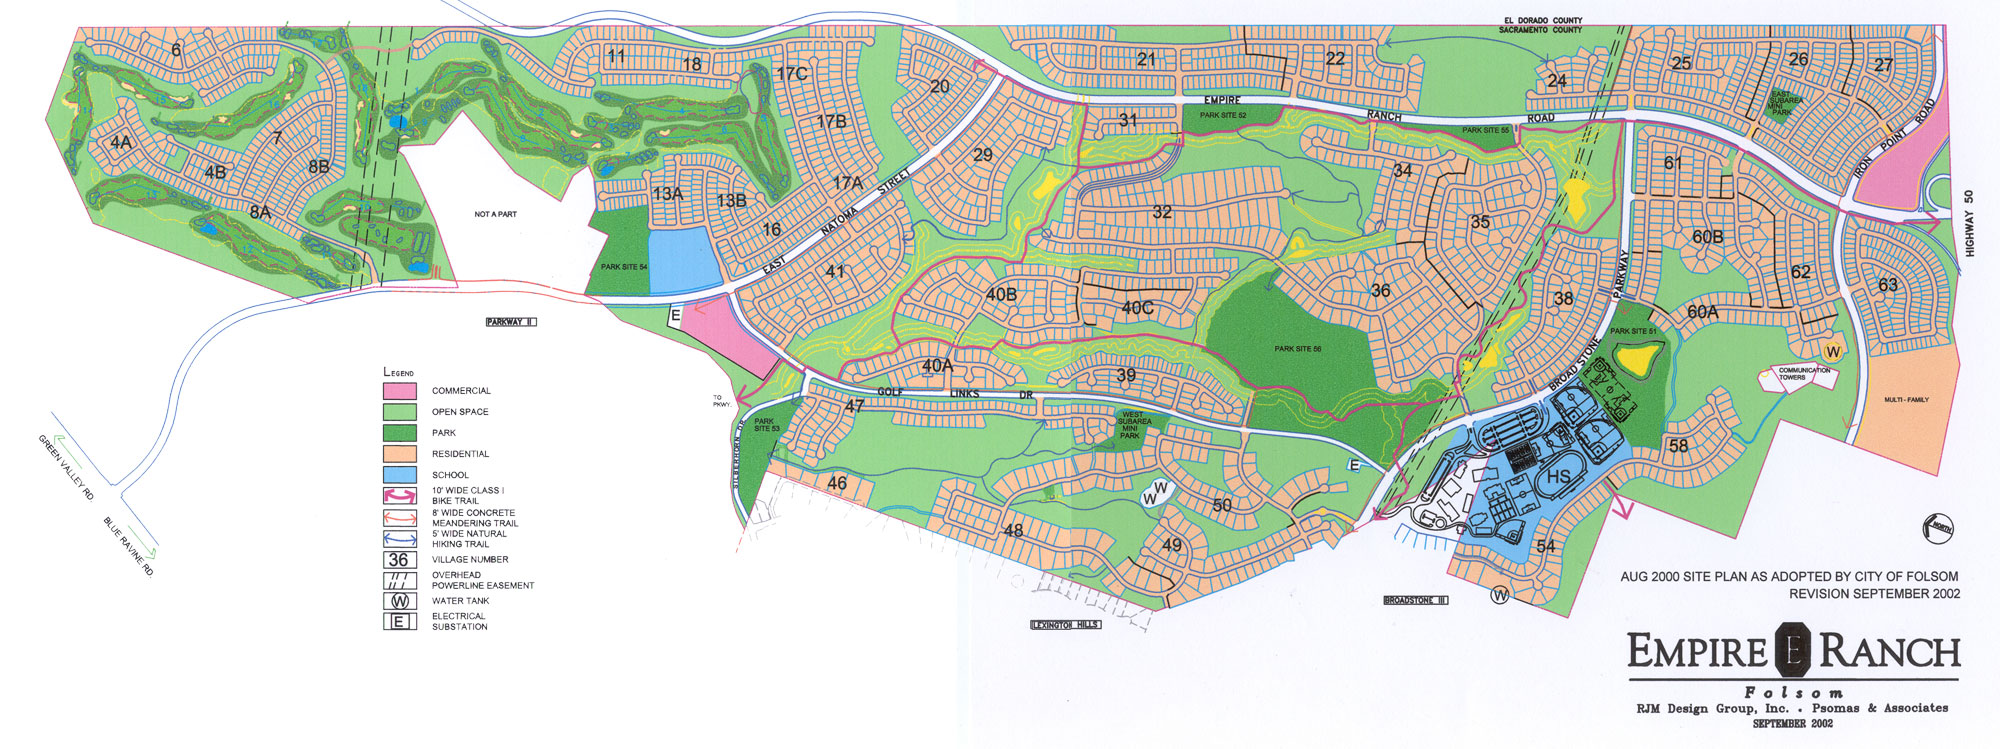 Folsom High School Campus Map.Rjmdesigngroup Empire Ranch